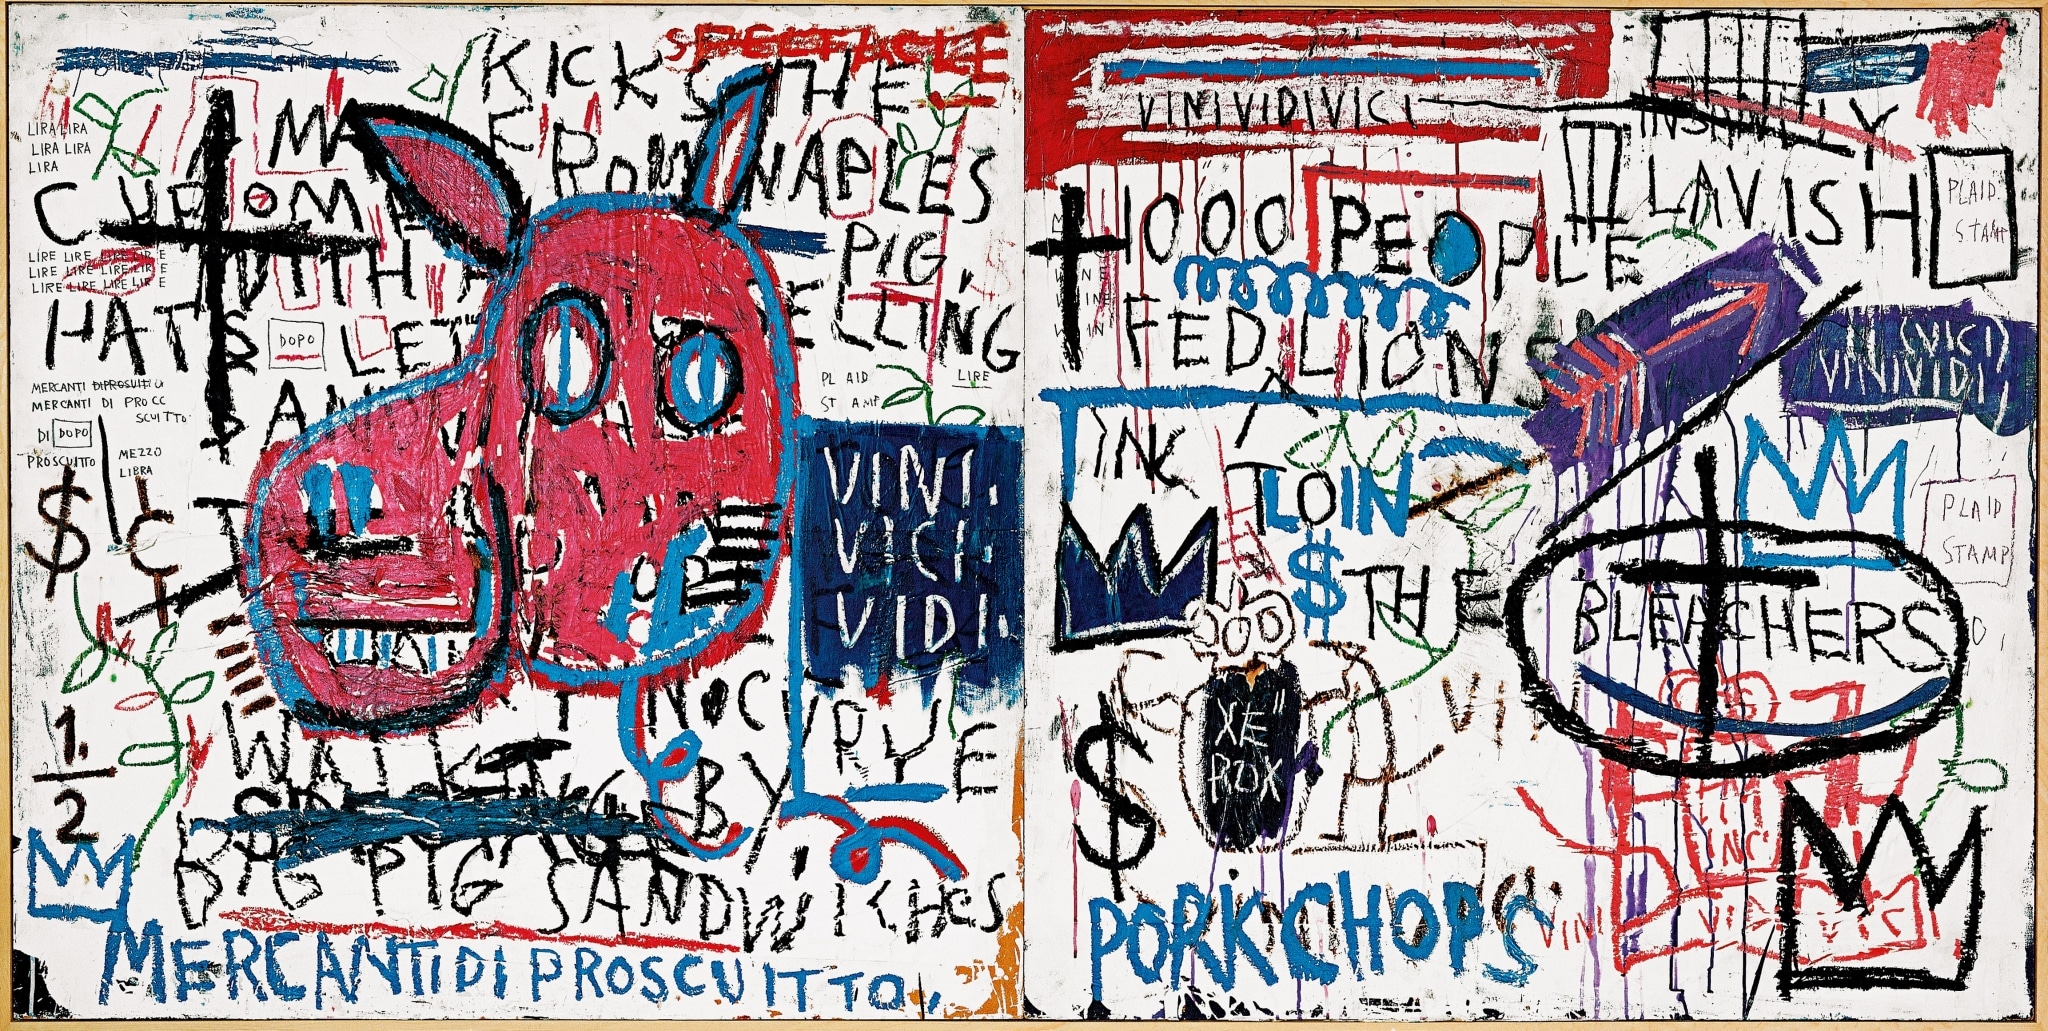 El hombre de Nápoles de Jean Michel Basquiat